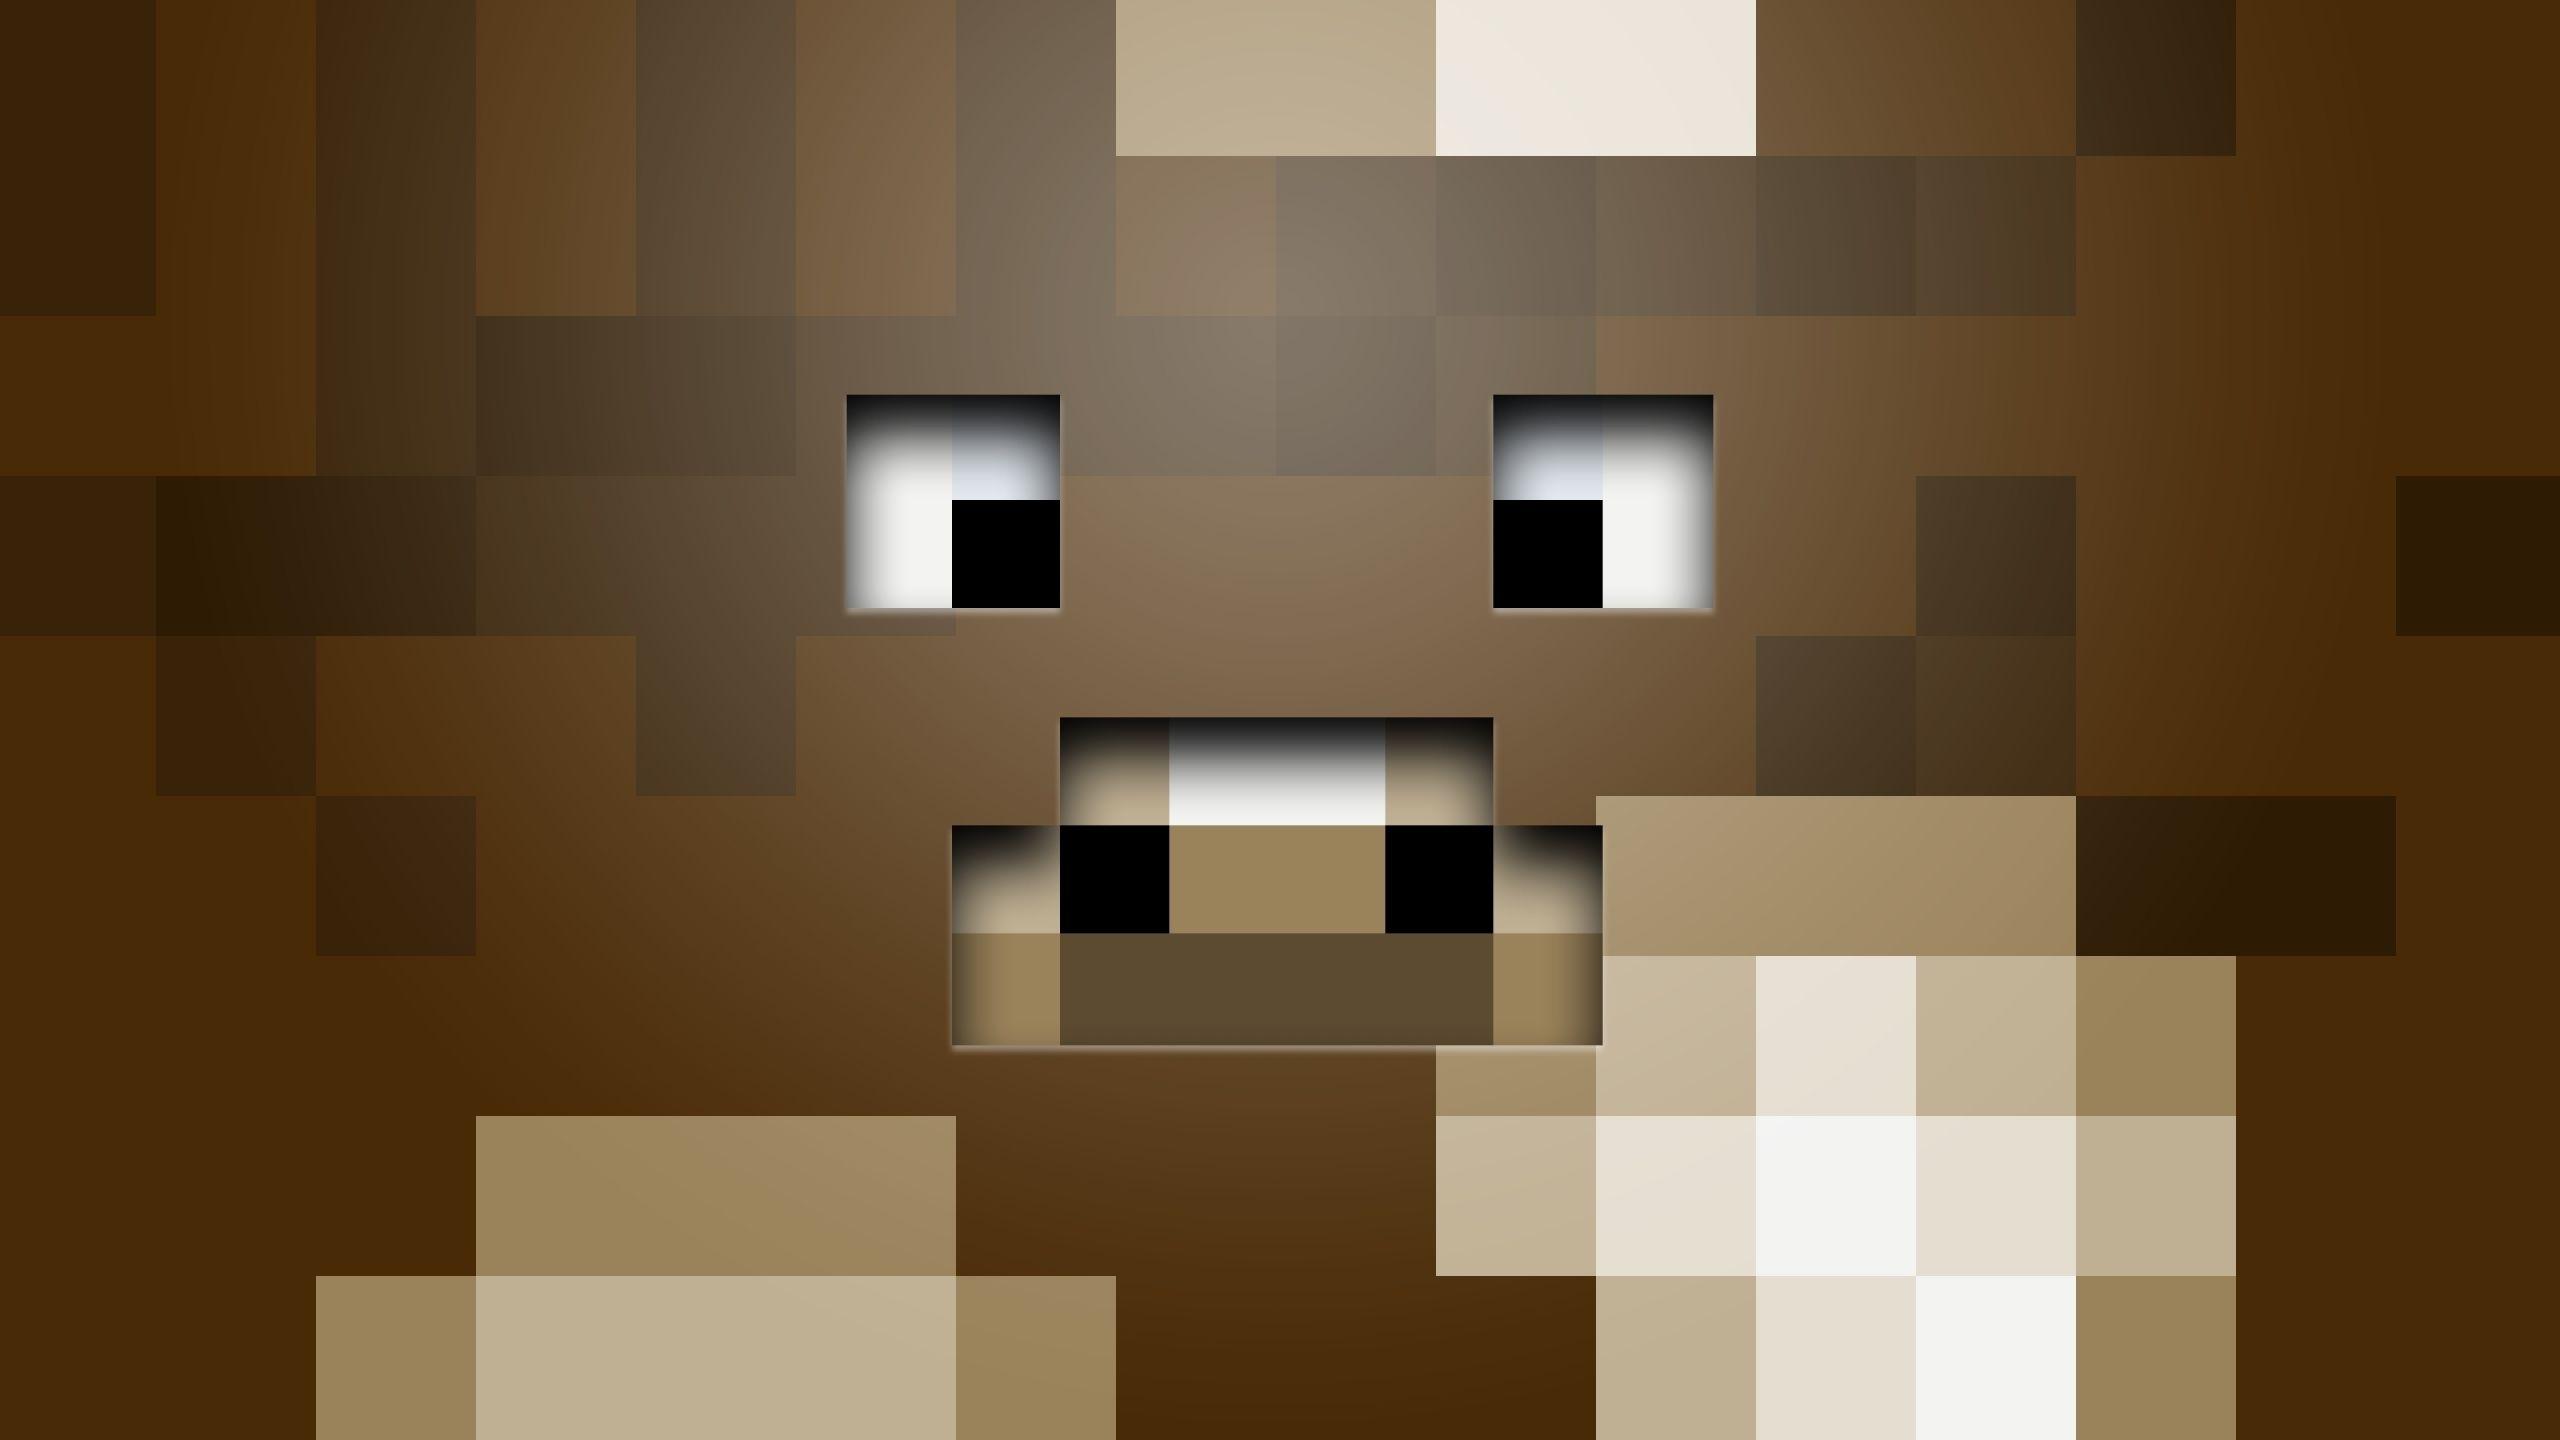 Most Inspiring Wallpaper Minecraft Galaxy - 3e0163b04df97d00216ced01c5c87779  Trends_896410.jpg